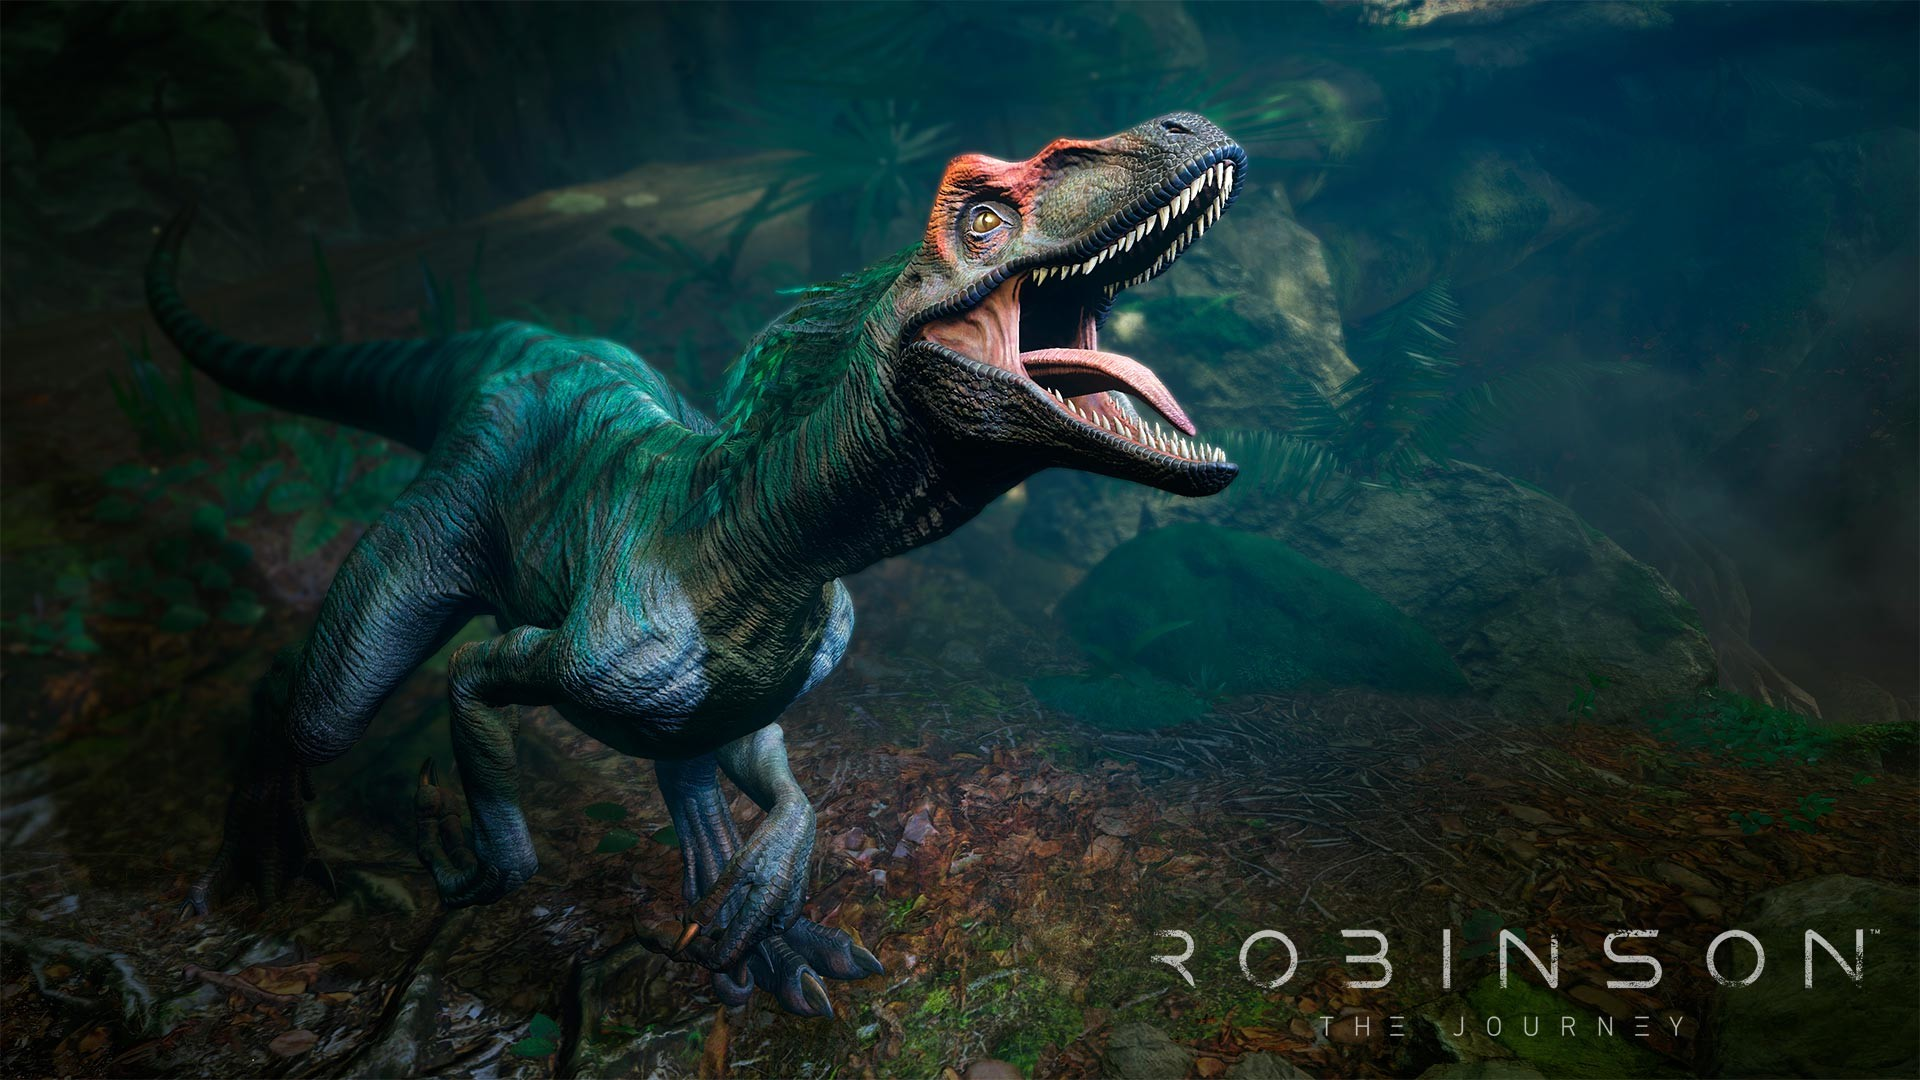 Joe garth robinson the journey screenshot raptor close up